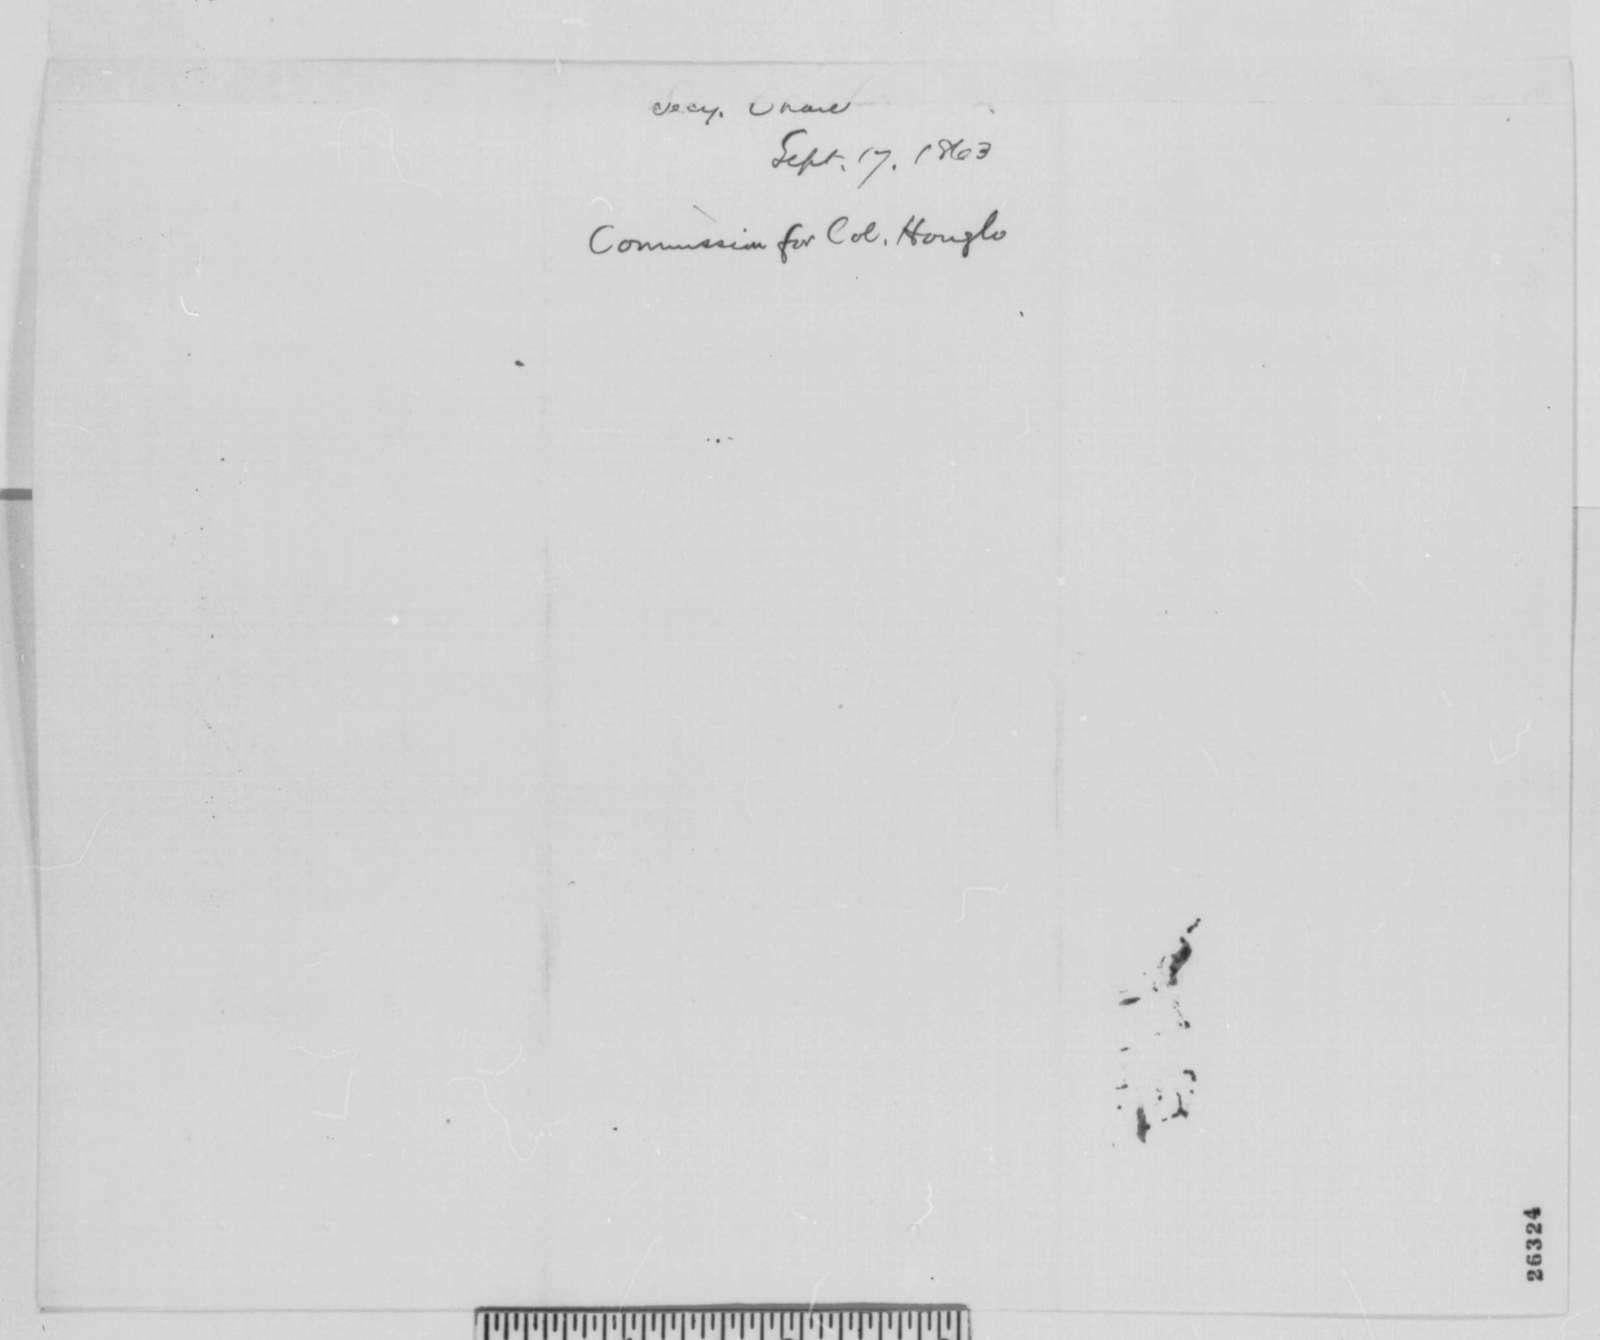 Salmon P. Chase to Abraham Lincoln, Thursday, September 17, 1863  (Sends commission)